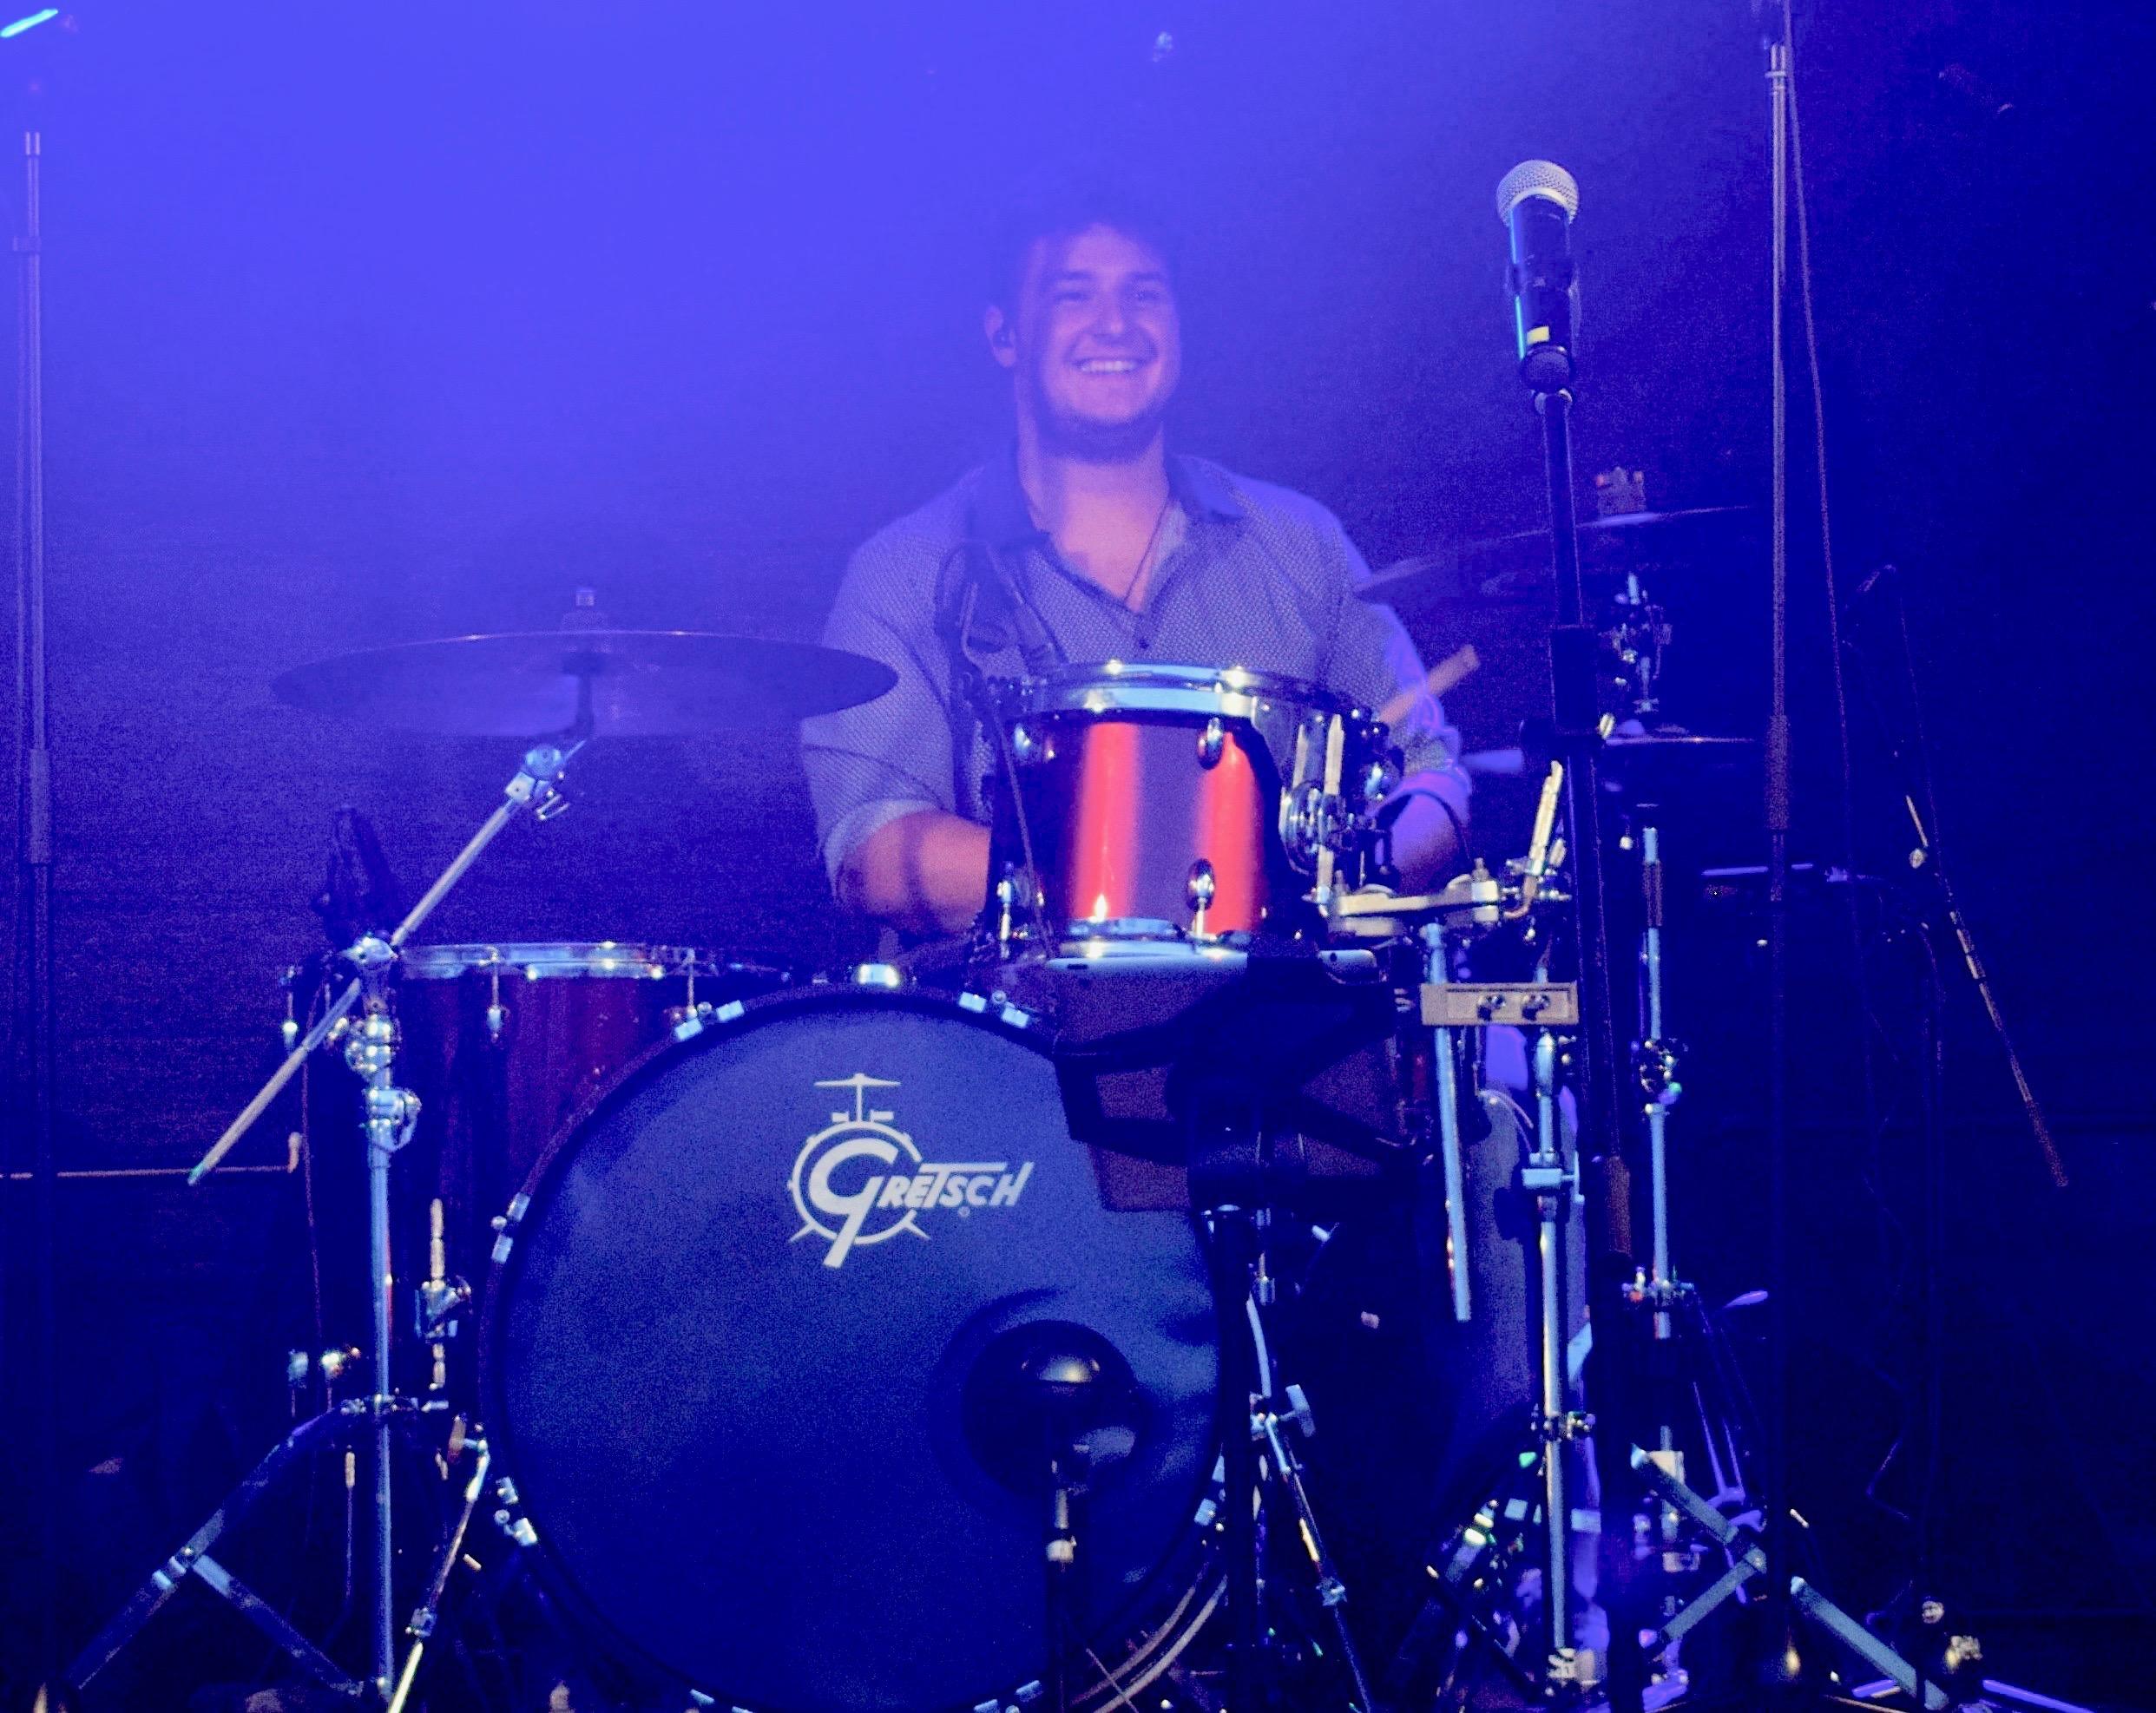 Justus Landeck